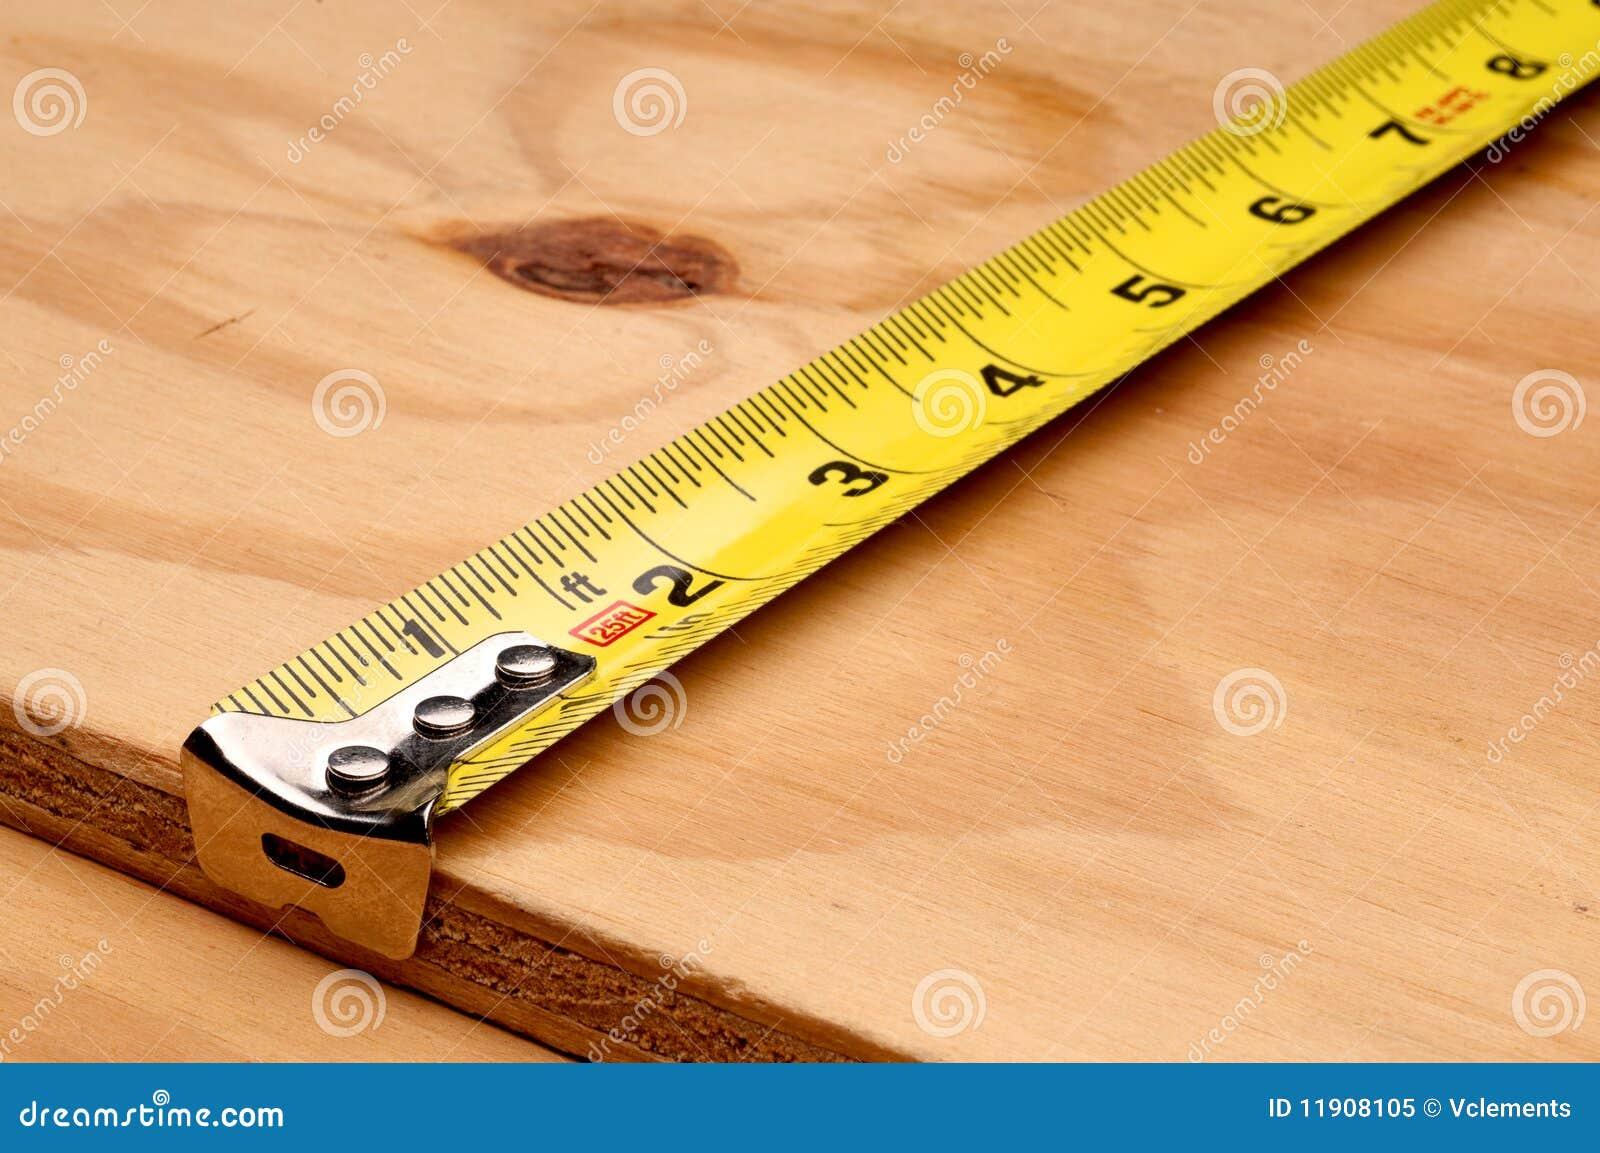 Tape Measure Measuring Wood Stock Image Image 11908105